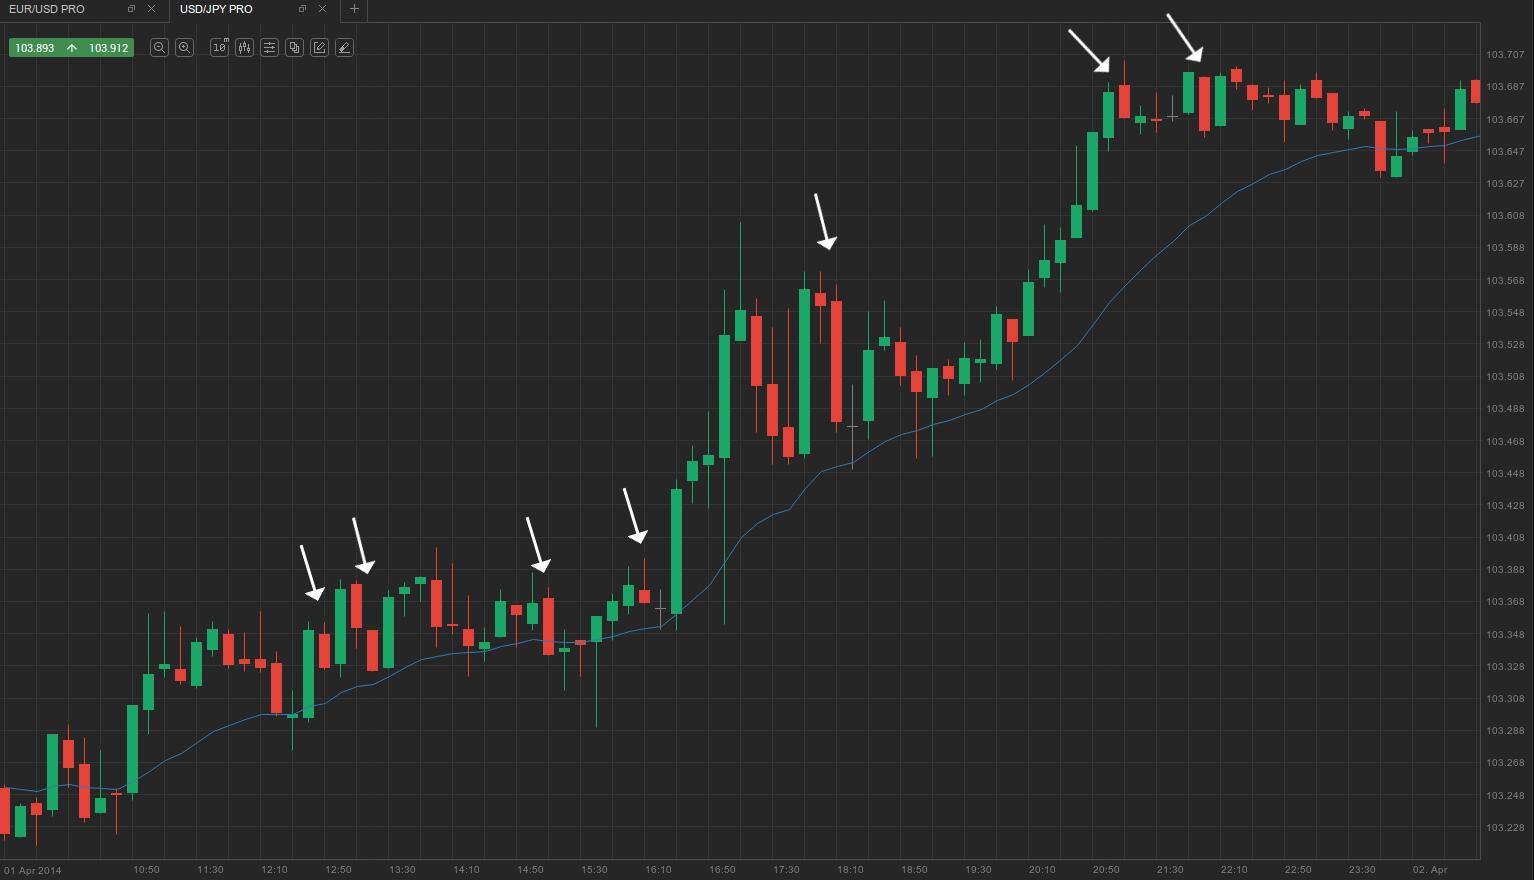 1.Trend + failed reversal bars